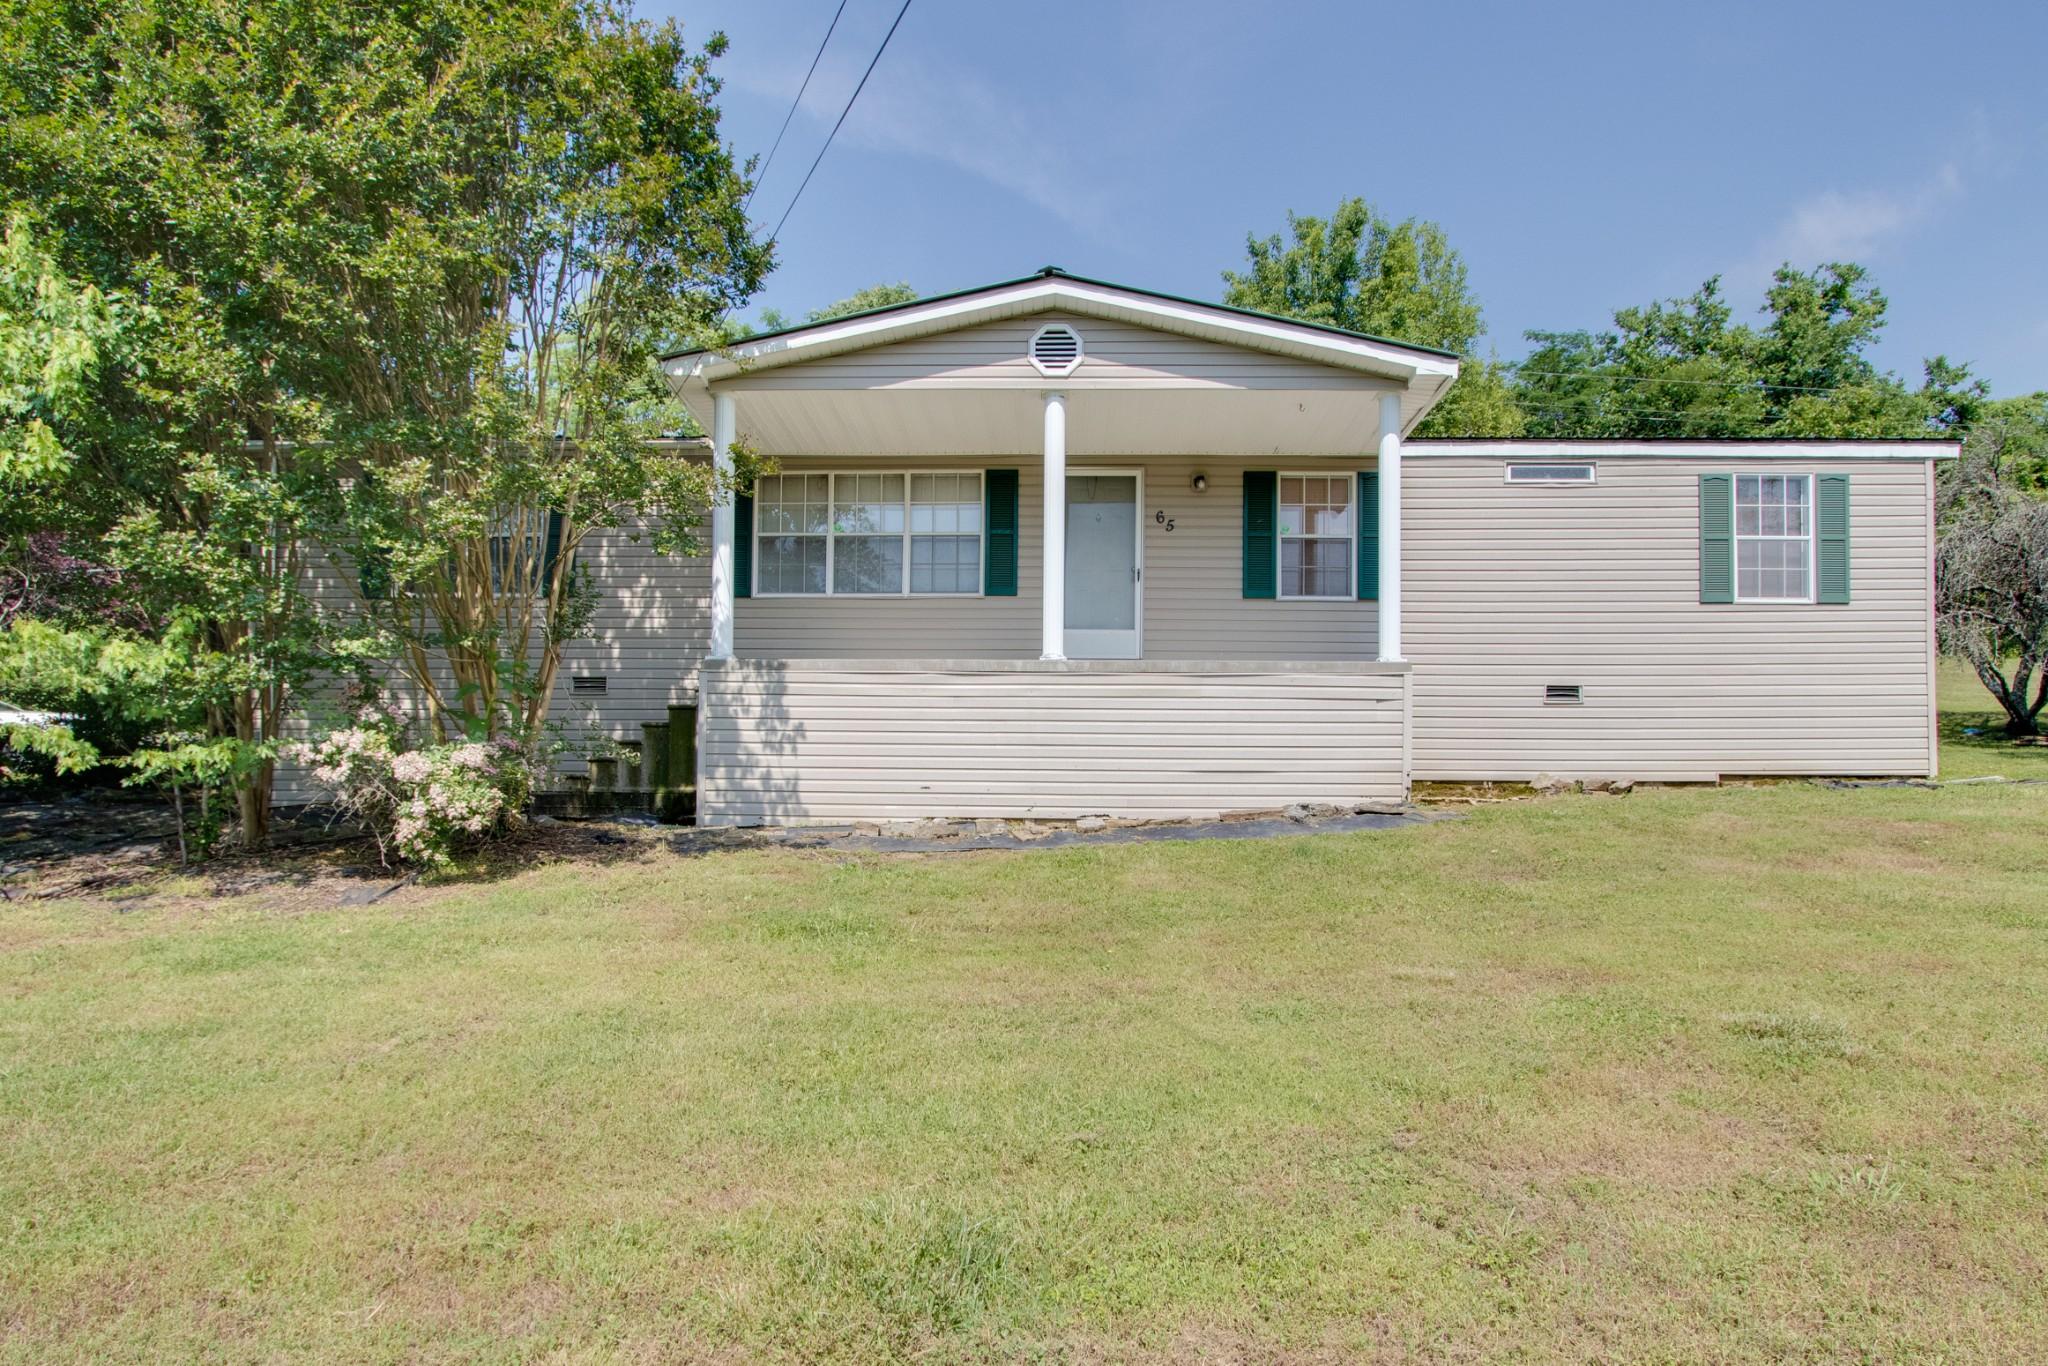 65 Horseshoe Bend Ln Property Photo - Elmwood, TN real estate listing